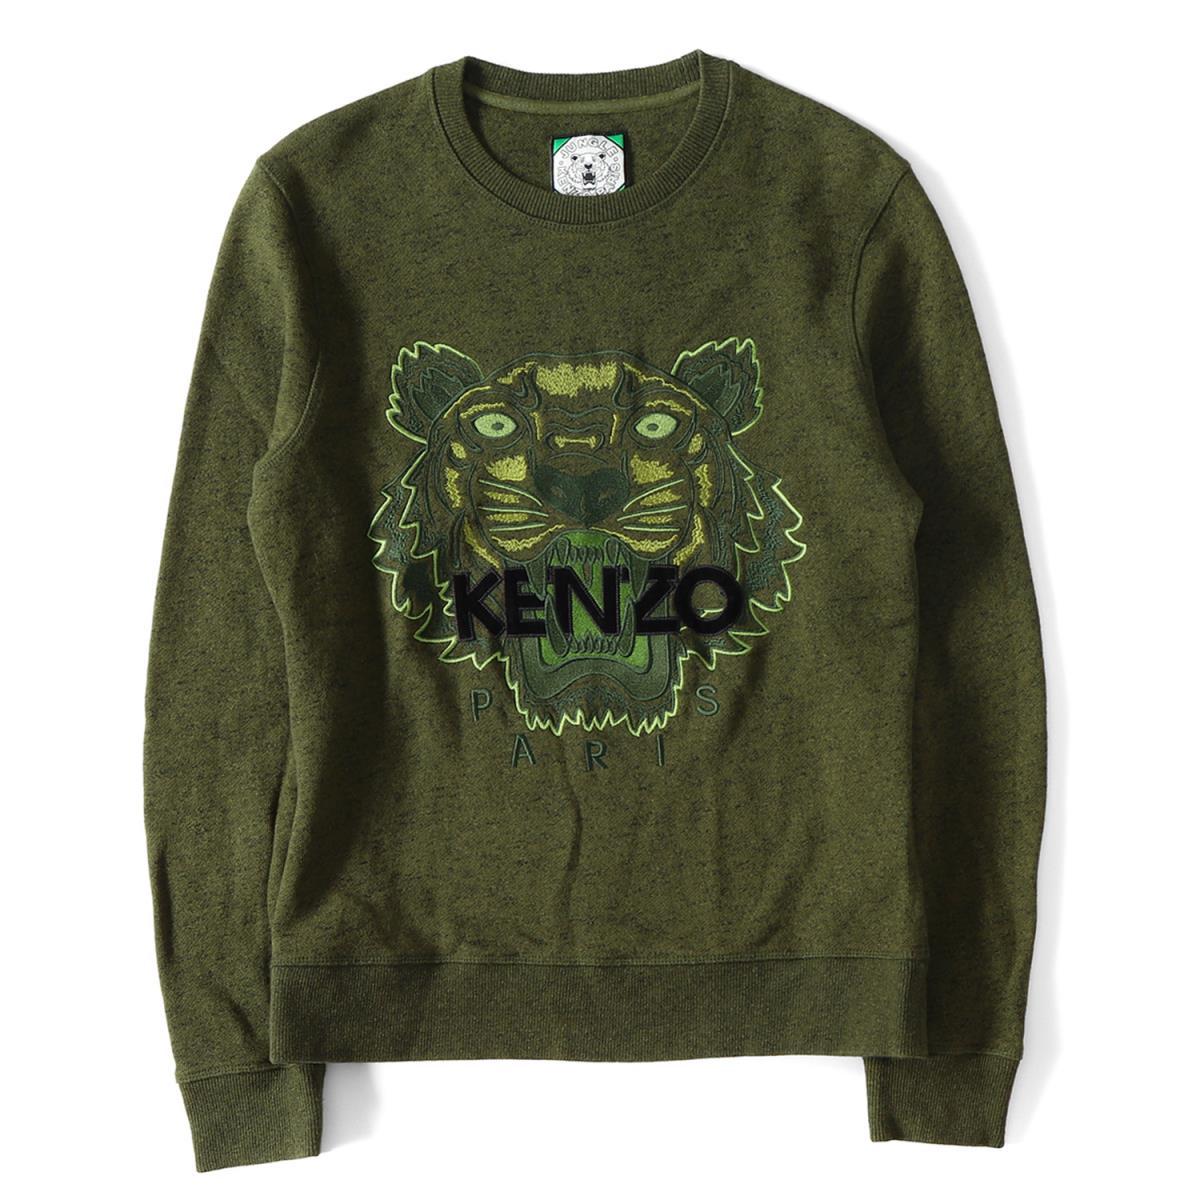 ea42bc24 KENZO (Kenzo) big tiger embroidery crew neck sweat shirt (Tiger Sweatshirt)  olive ...